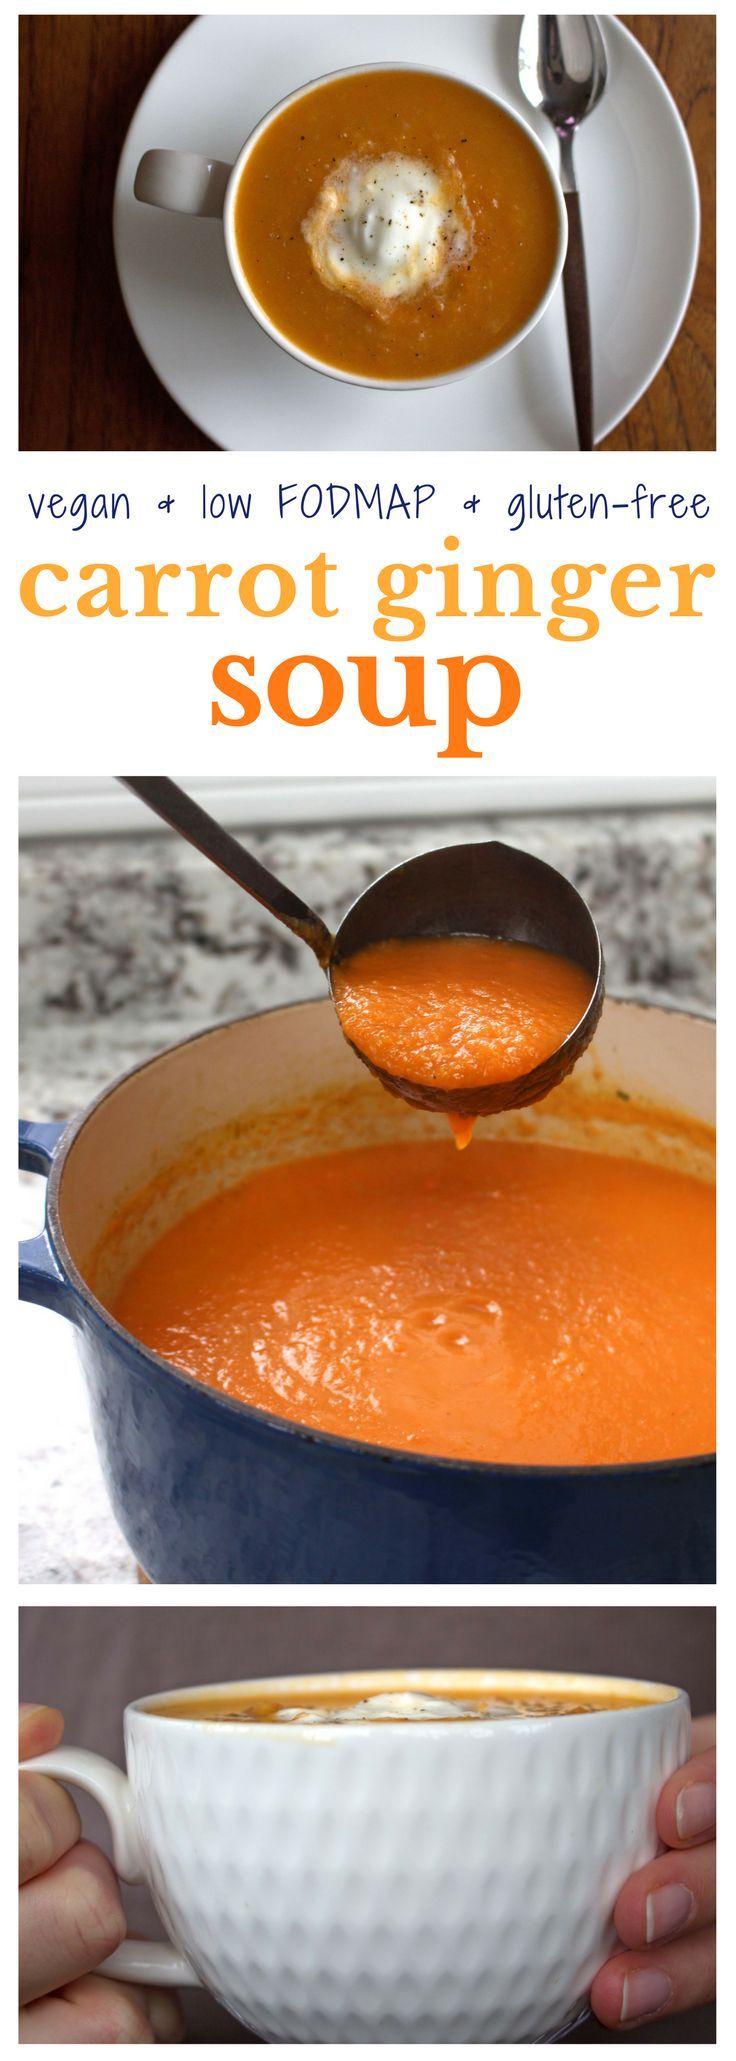 Vegan & Low FODMAP Carrot Ginger Soup - Lauren Renlund MPH RD #soupedetoxminceur